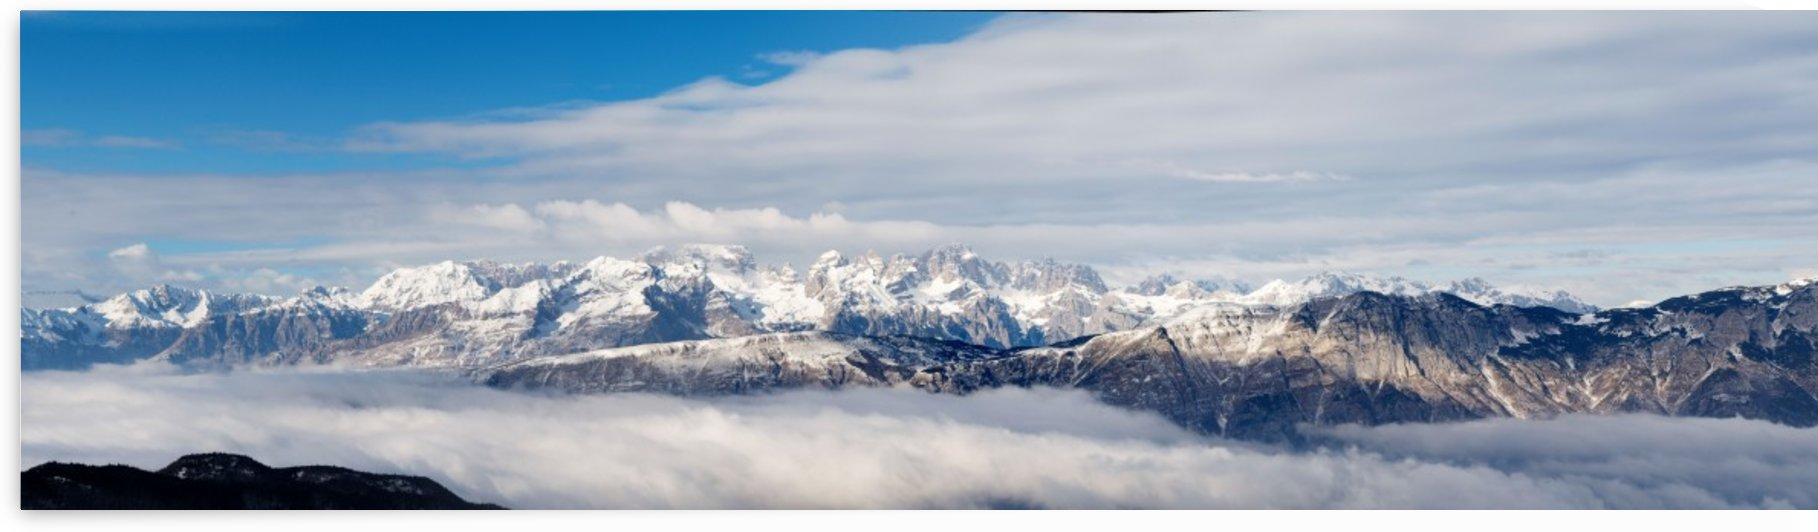 PanoramaSudTirol by adiciu